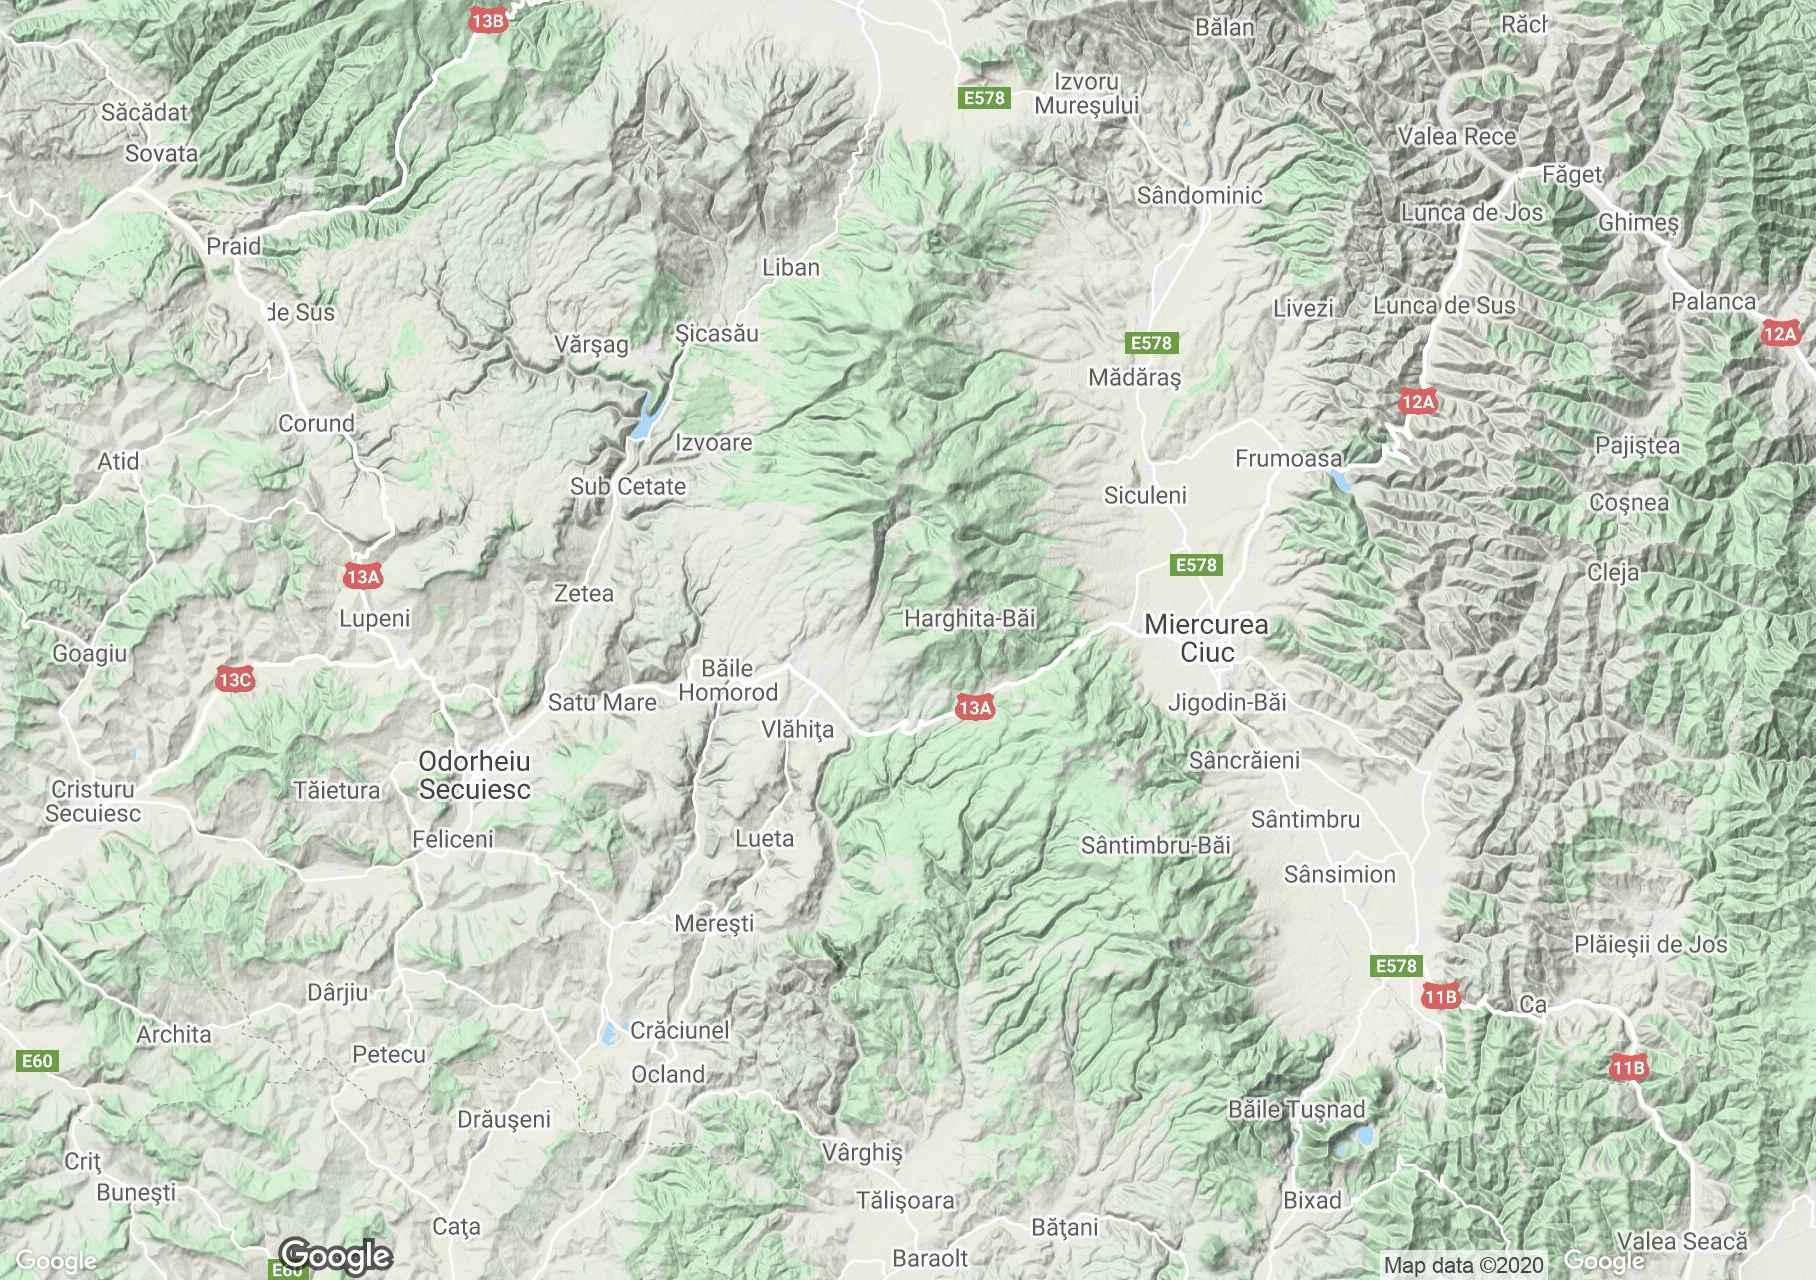 Hargita-hegység interaktív turista térképe.